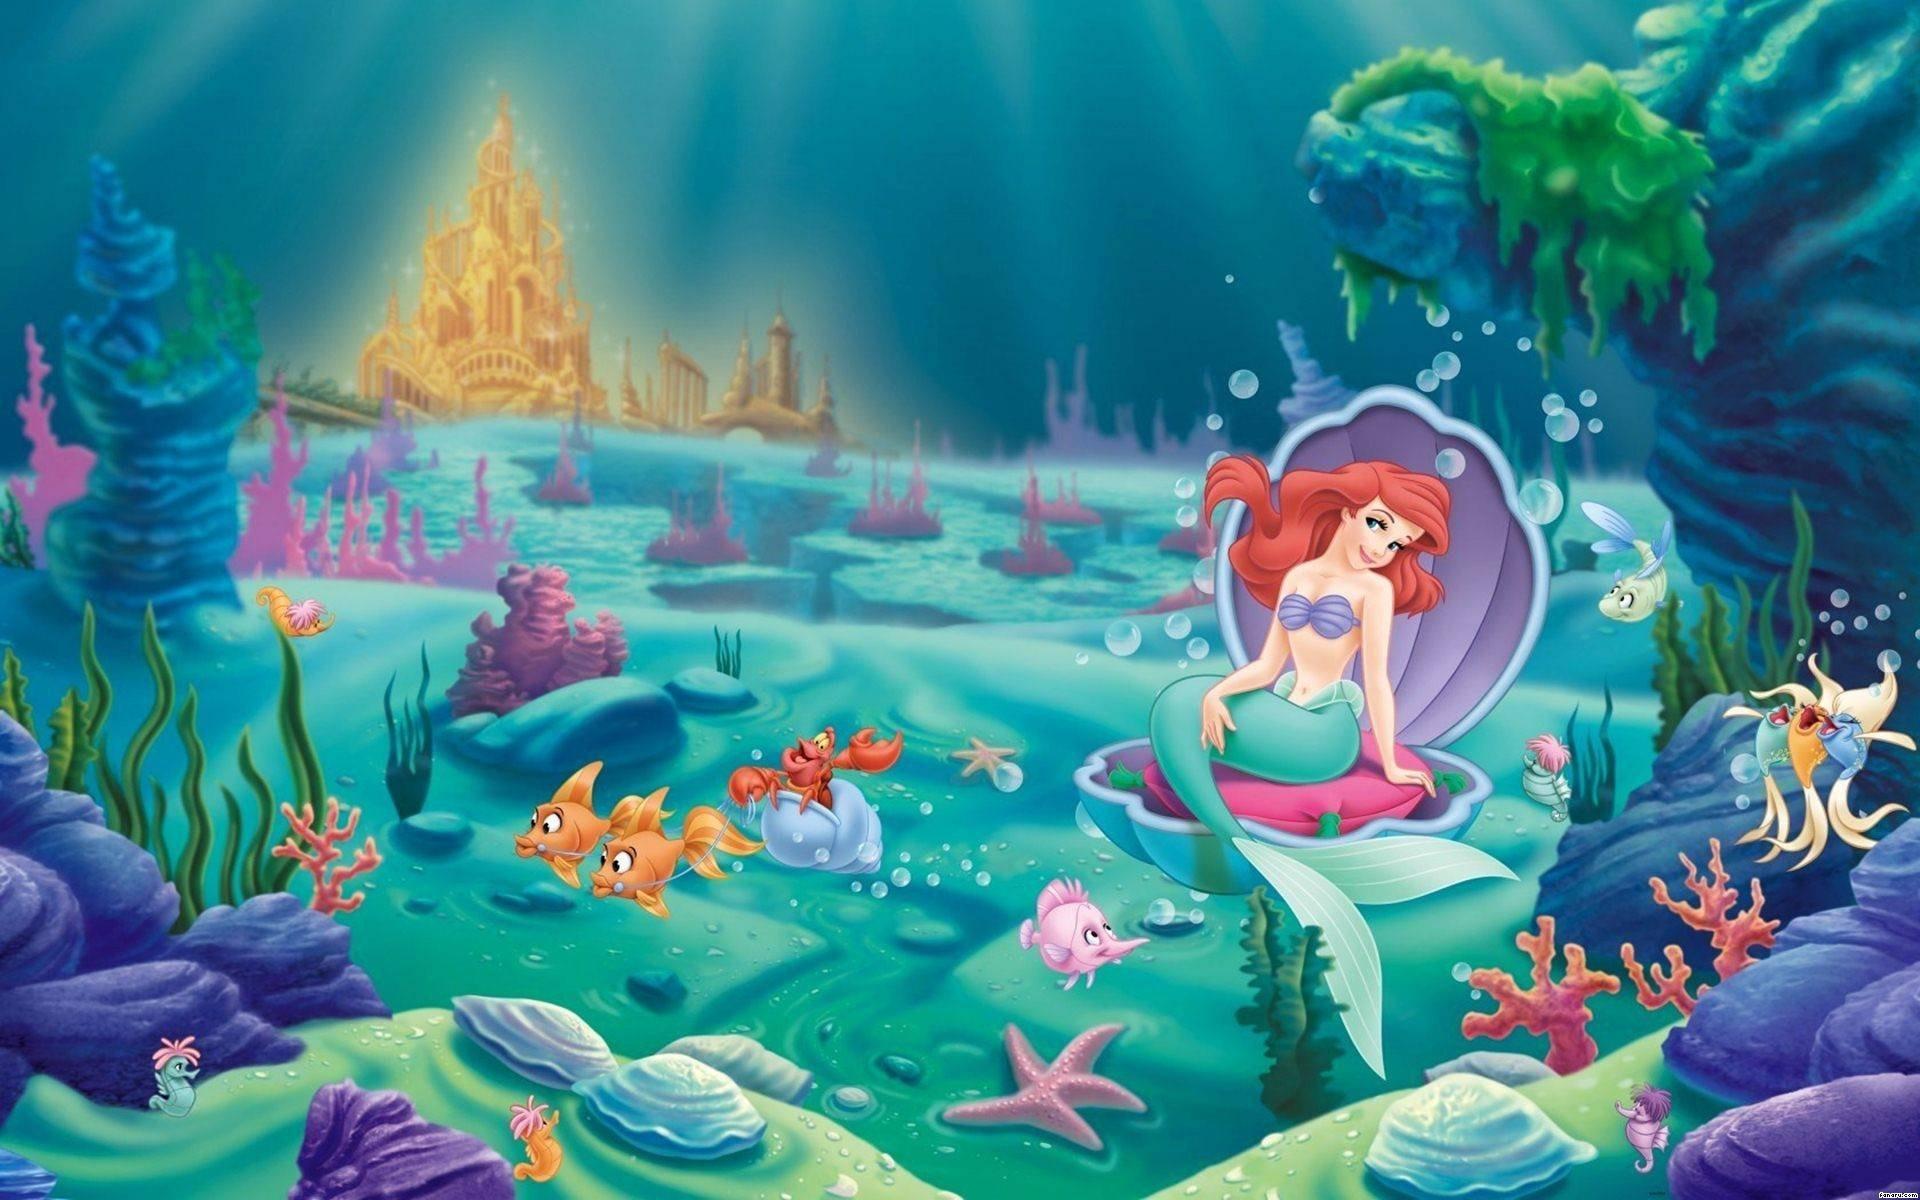 LITTLE MERMAID disney fantasy animation cartoon adventure family .